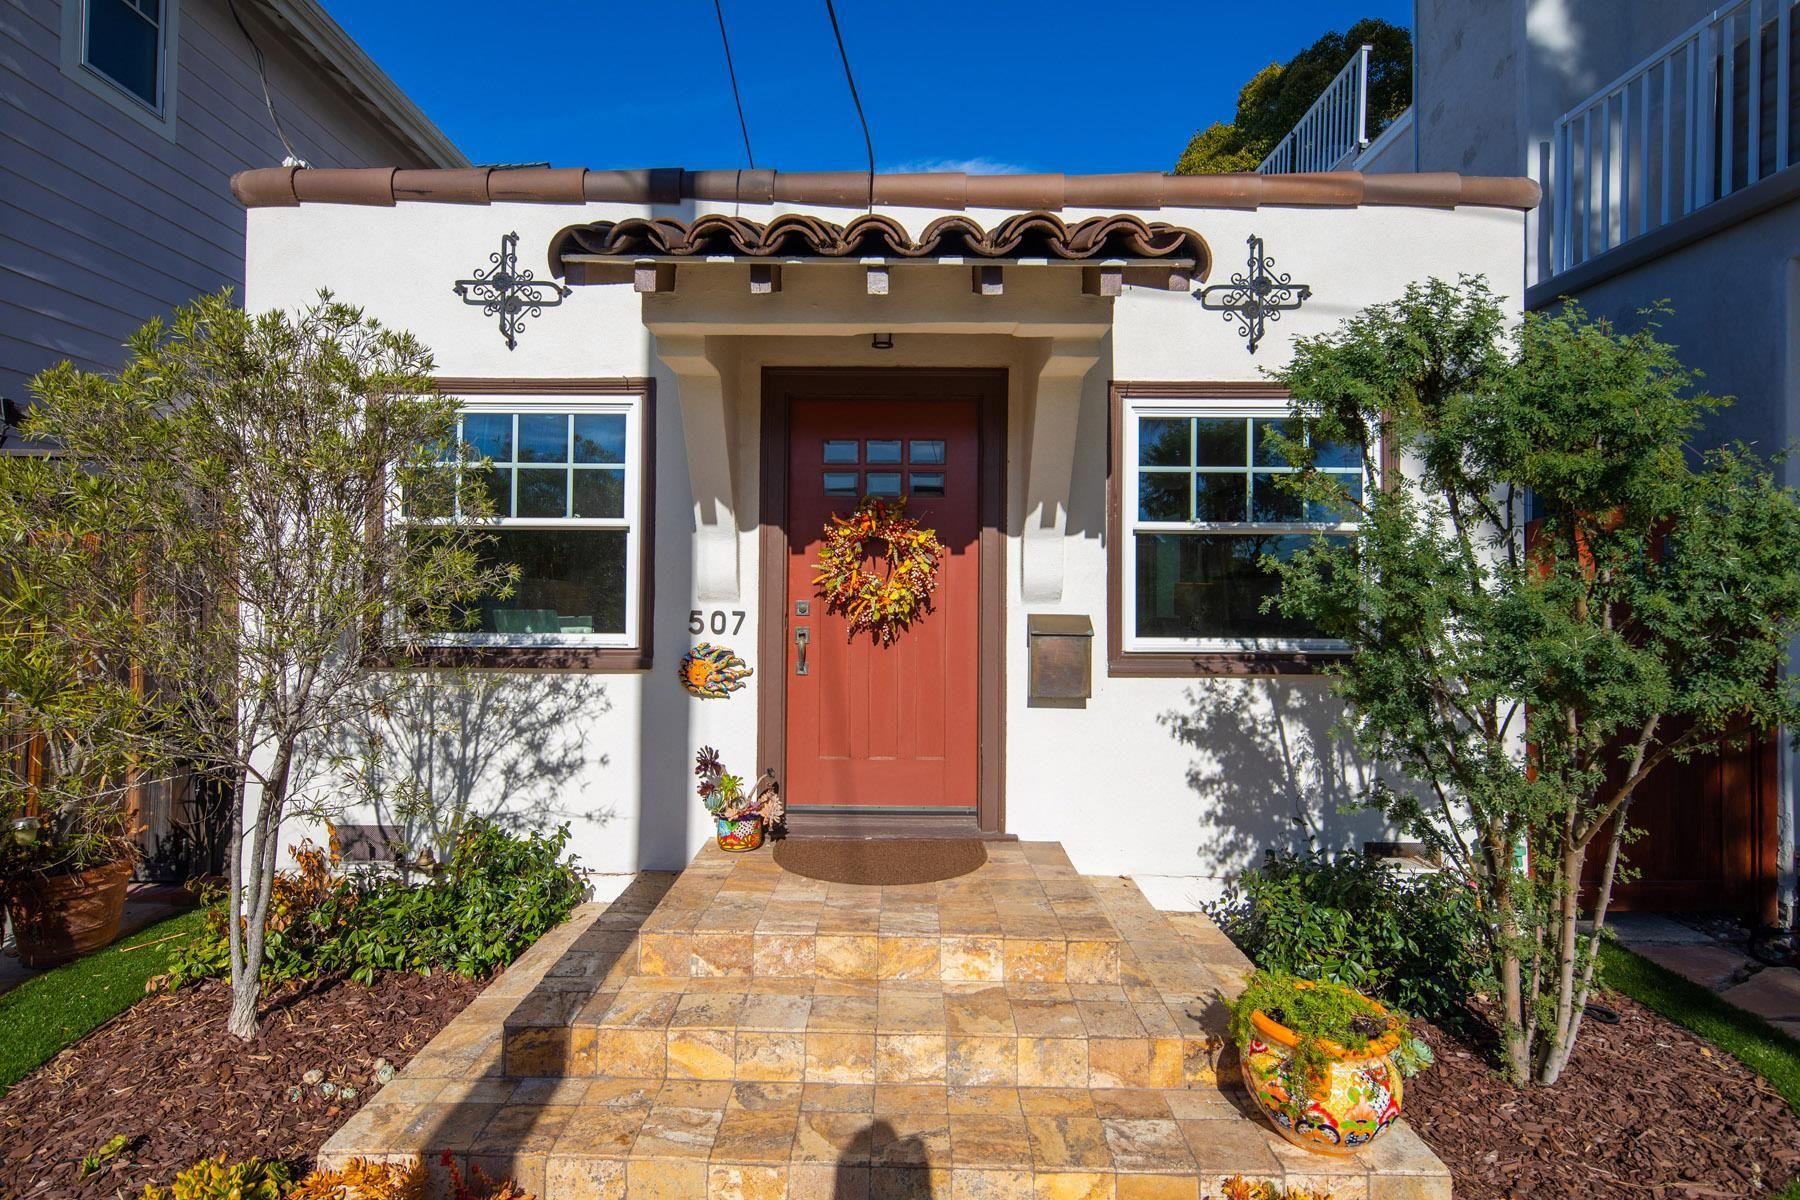 Main Photo: CORONADO VILLAGE House for sale : 1 bedrooms : 507 7th Street in Coronado